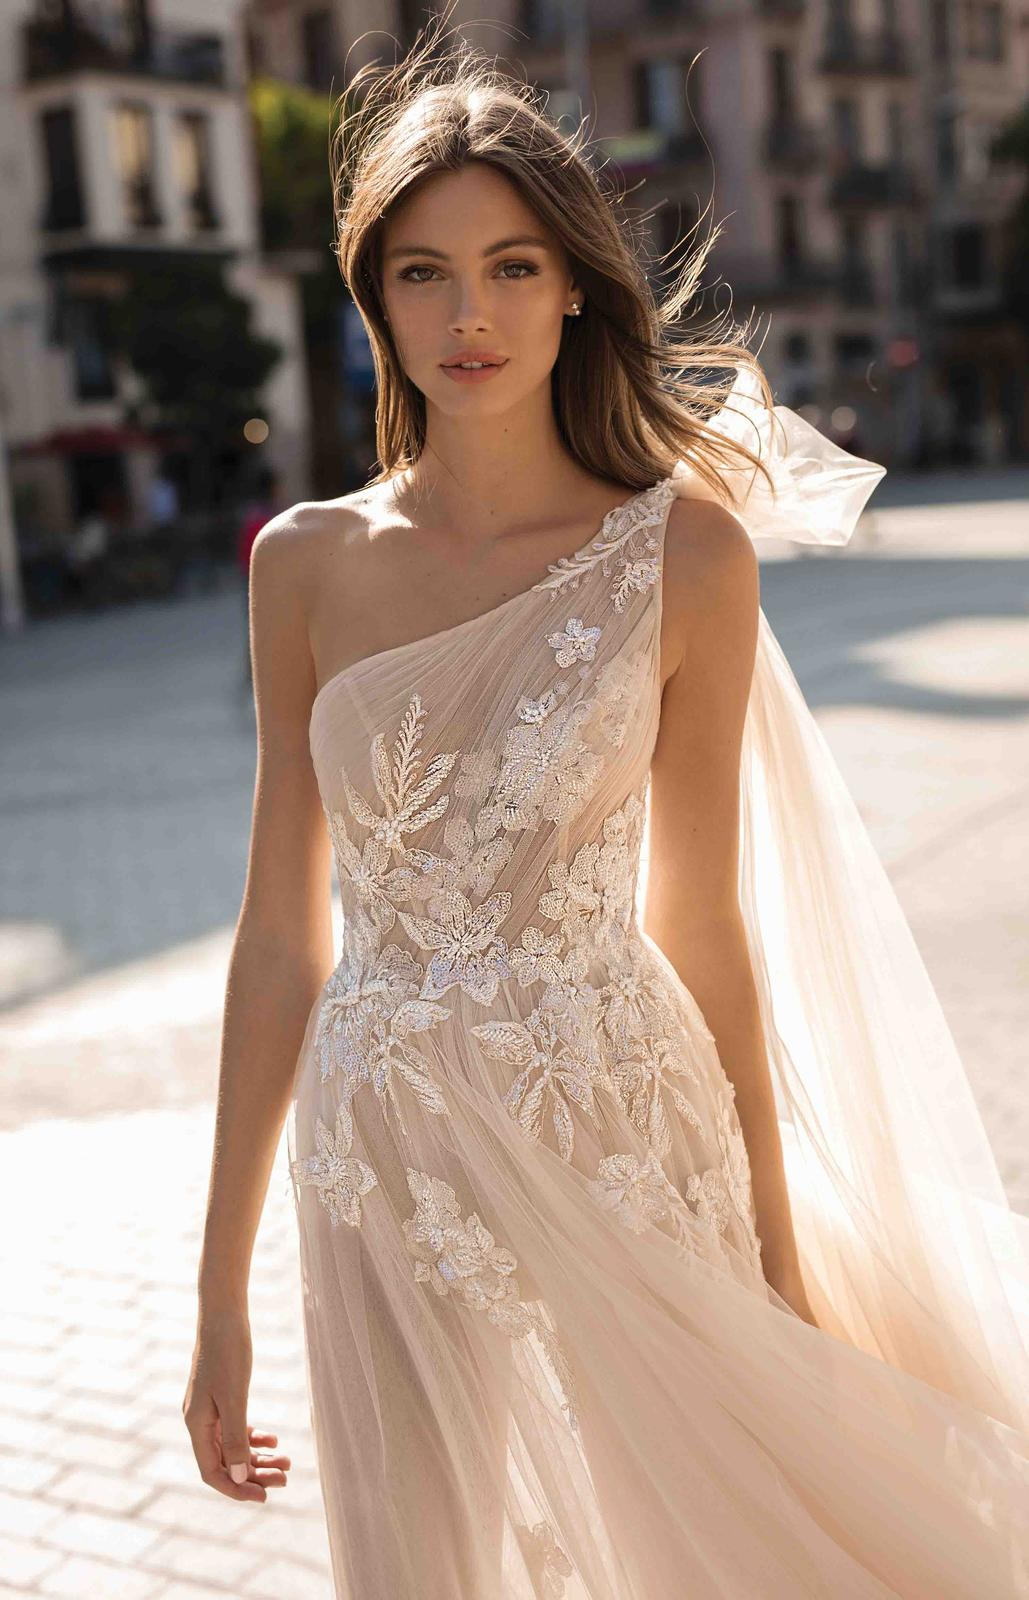 Muse by Berta * Svadobné šaty z kolekcií na rok 2019 - Obrázok č. 4